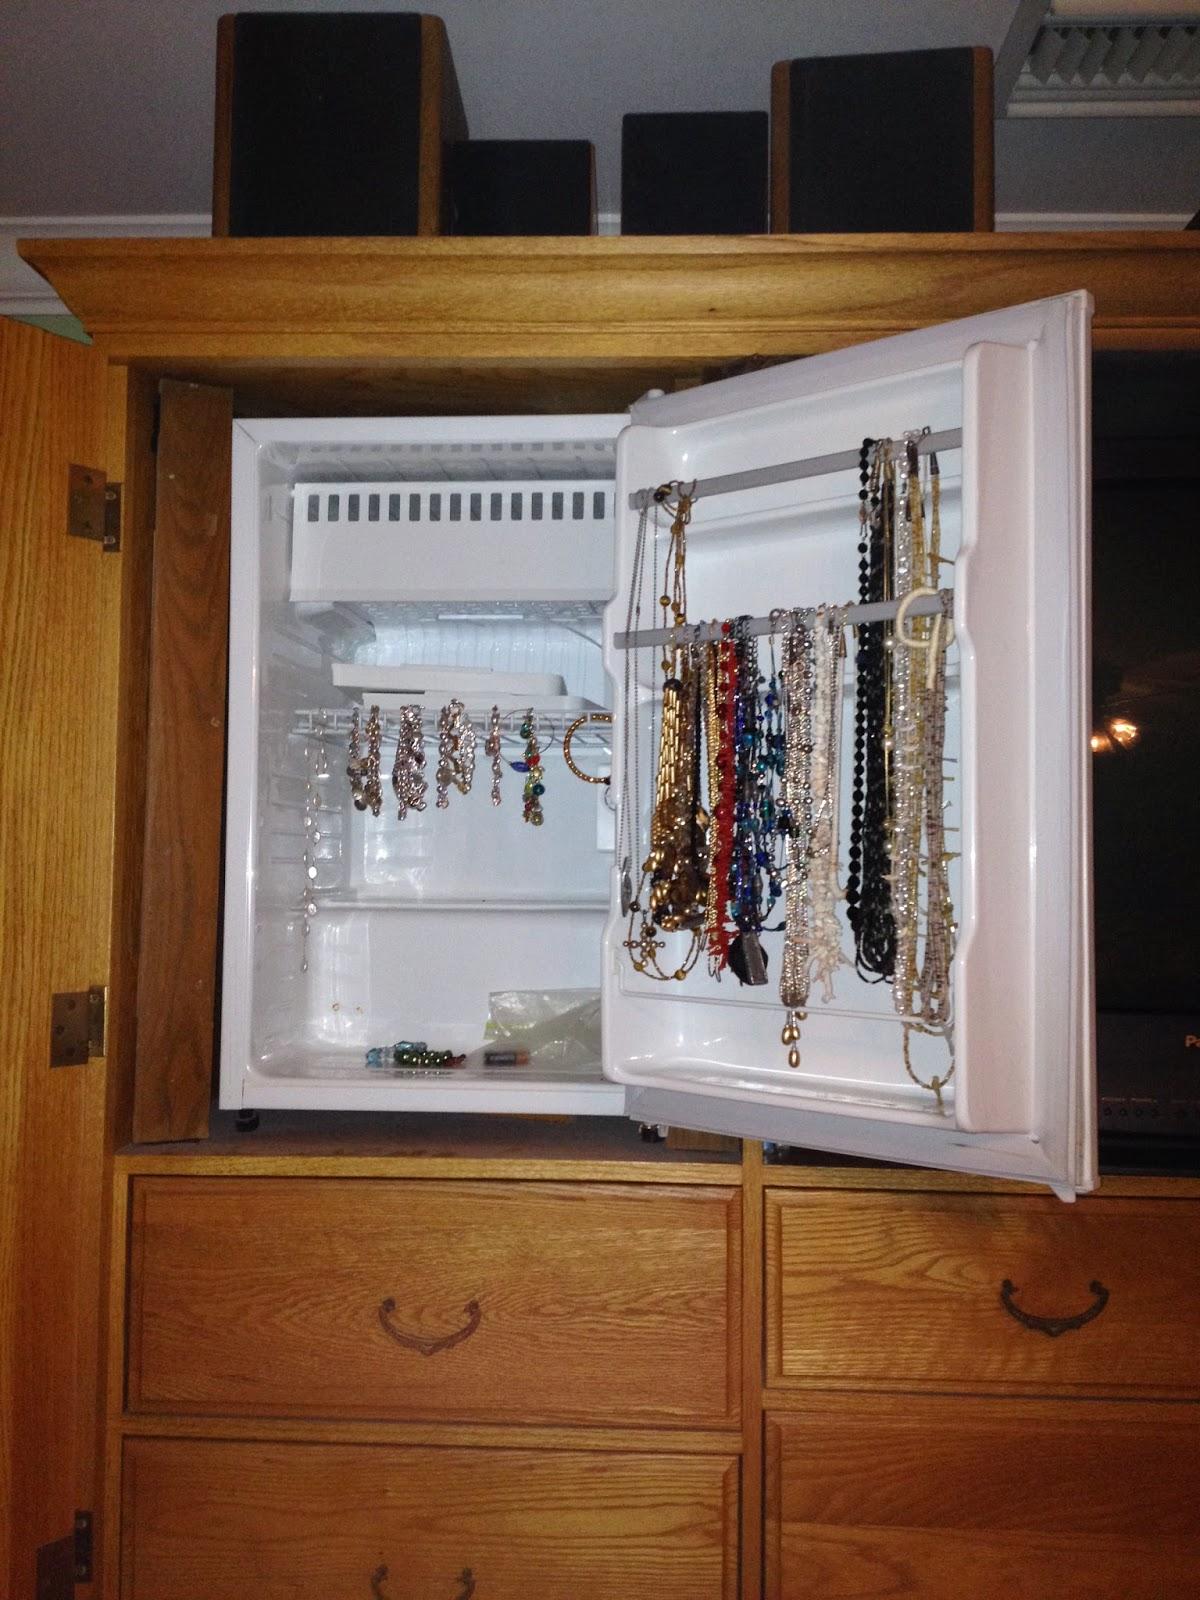 refrigerator in bedroom | makitaserviciopanama